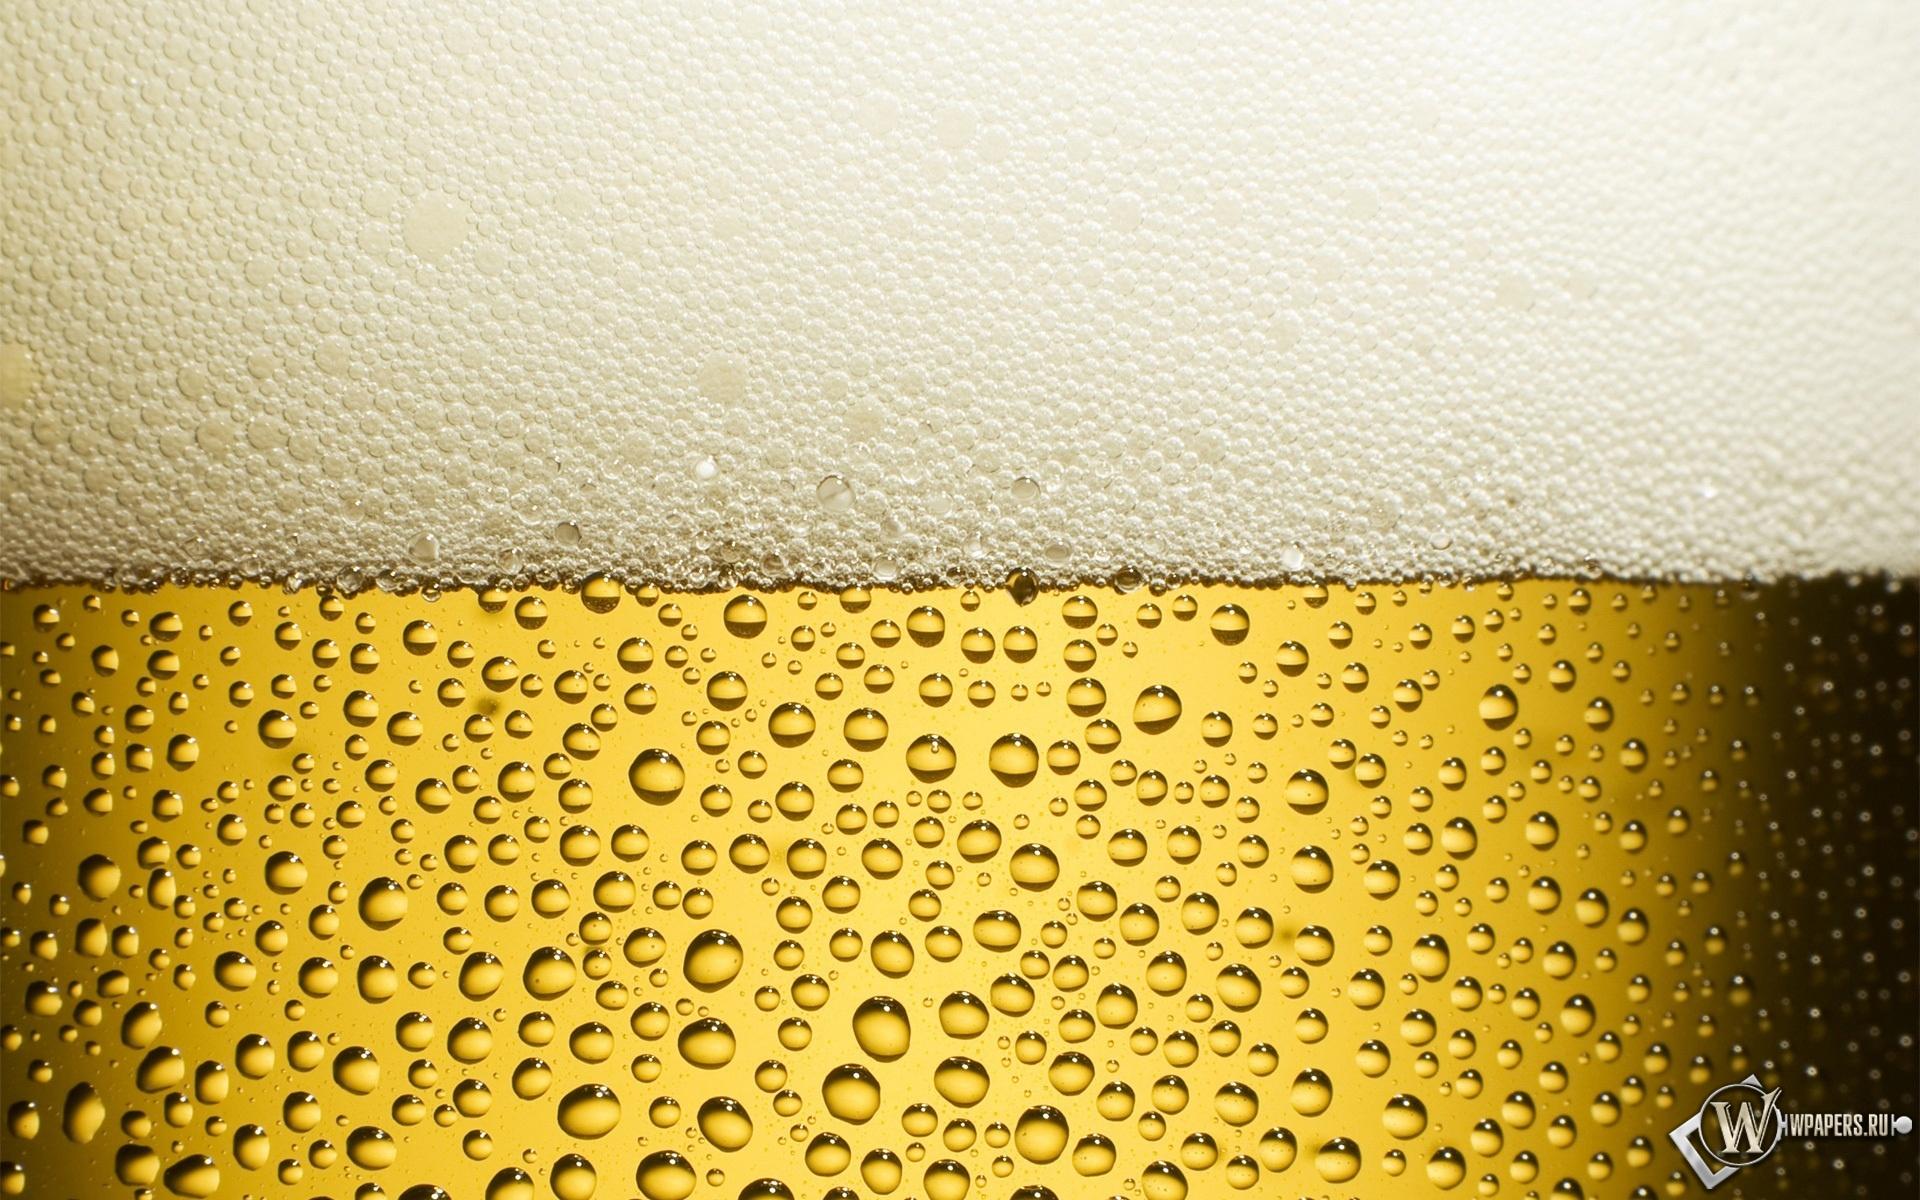 Пиво пенное 1920x1200